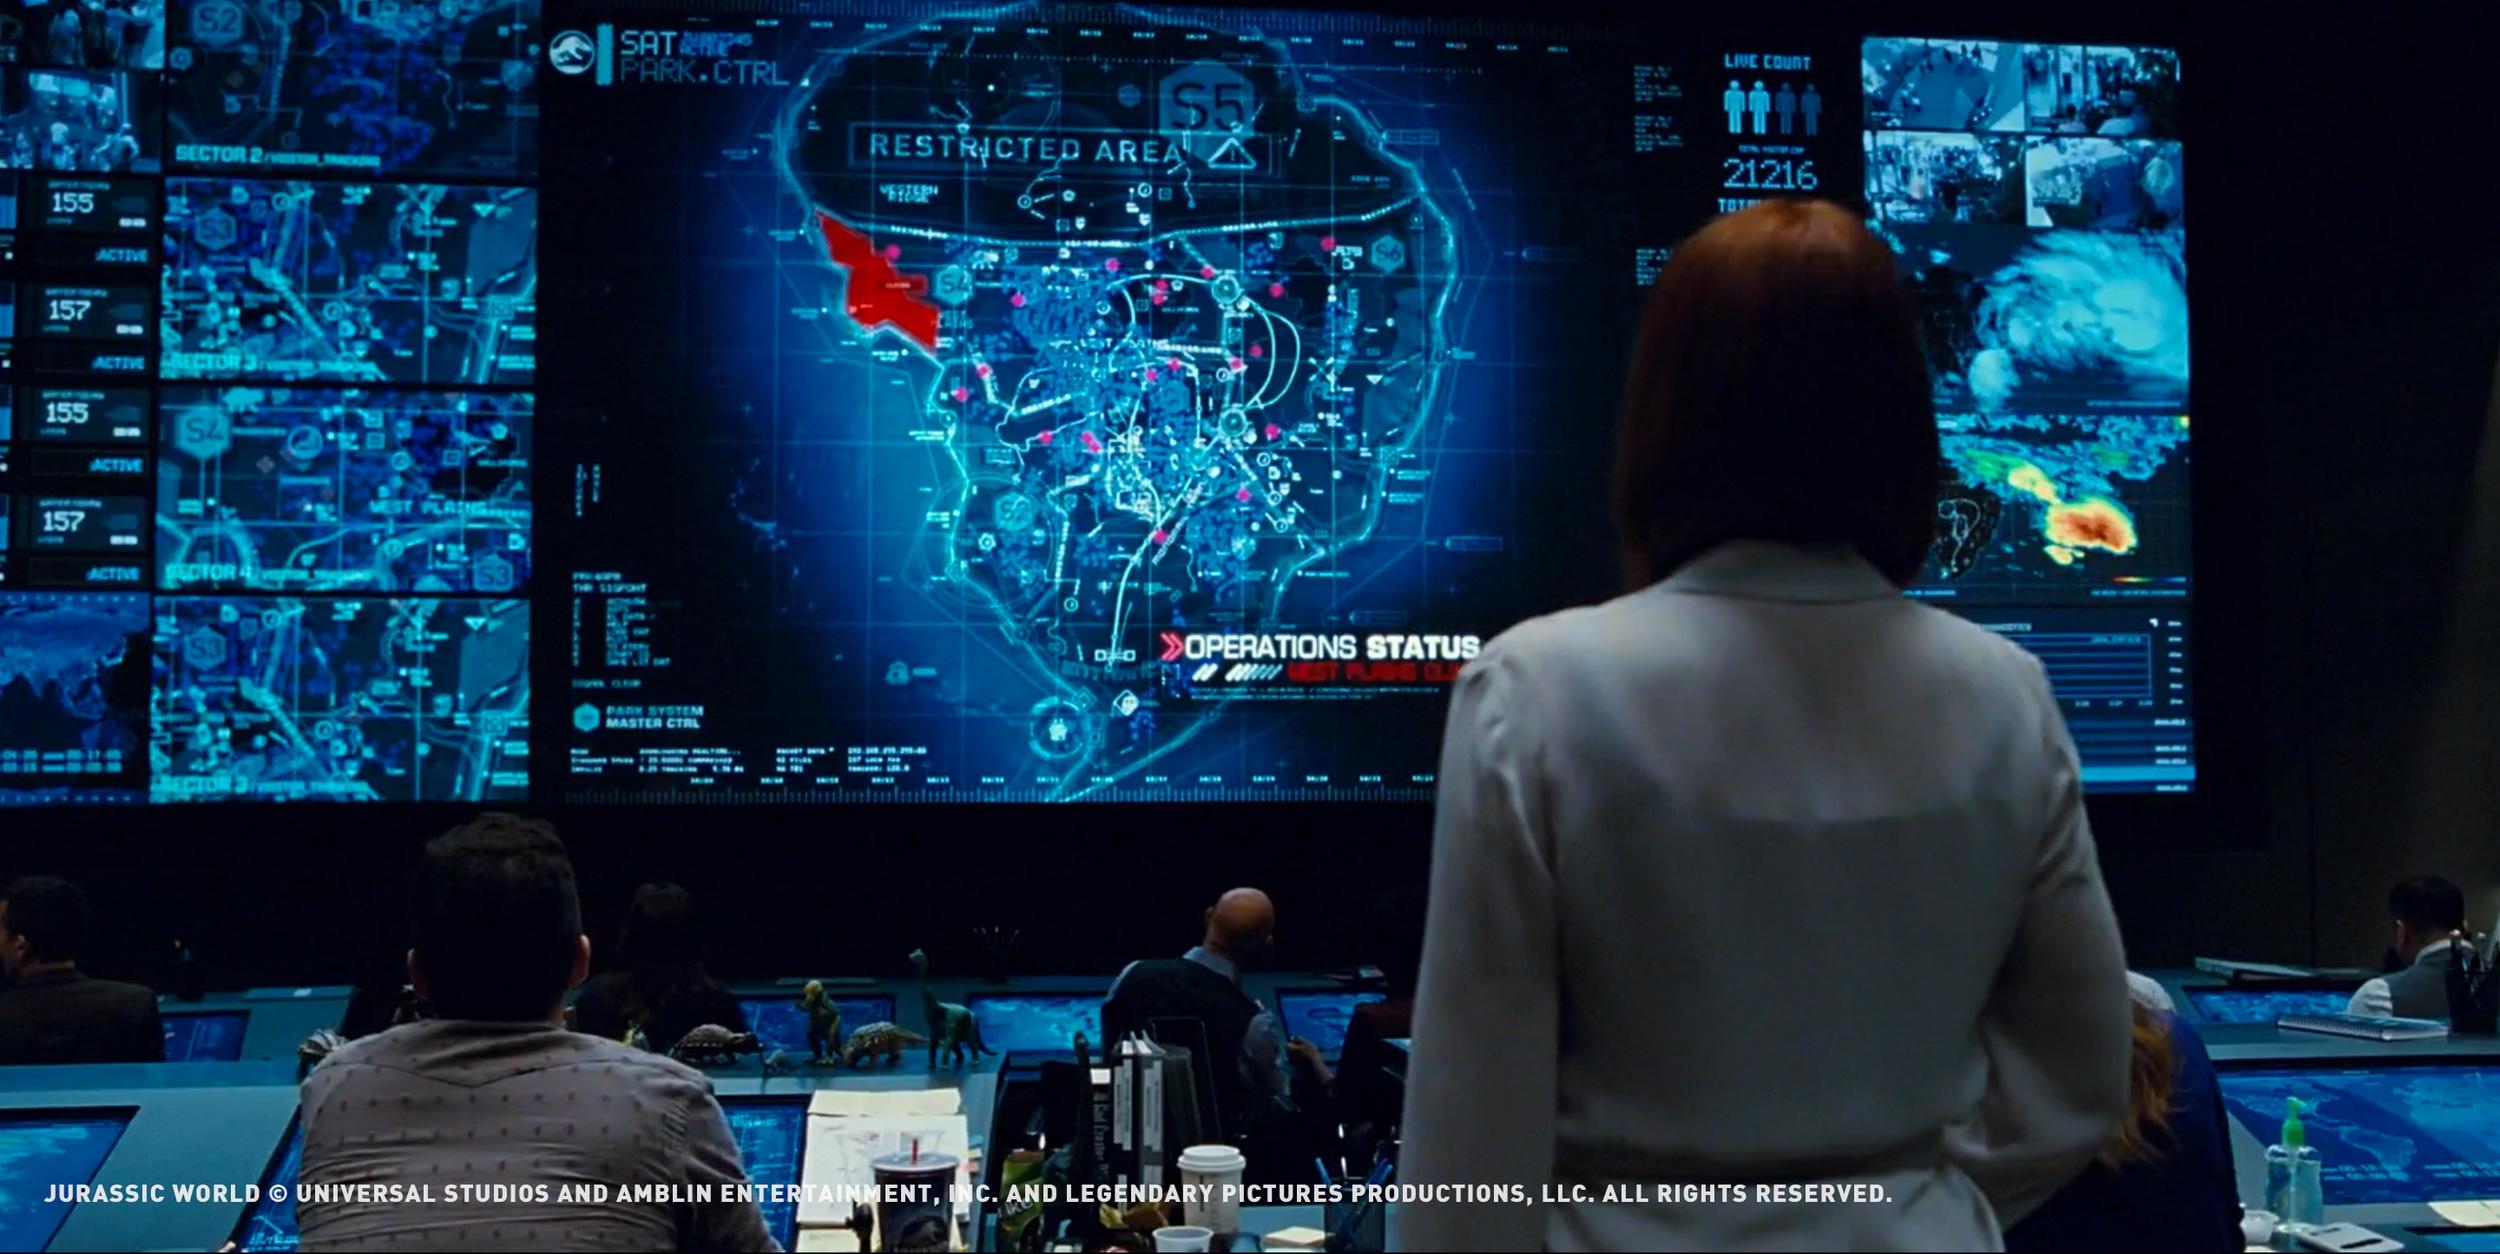 jurassic_control_room_map5.jpg